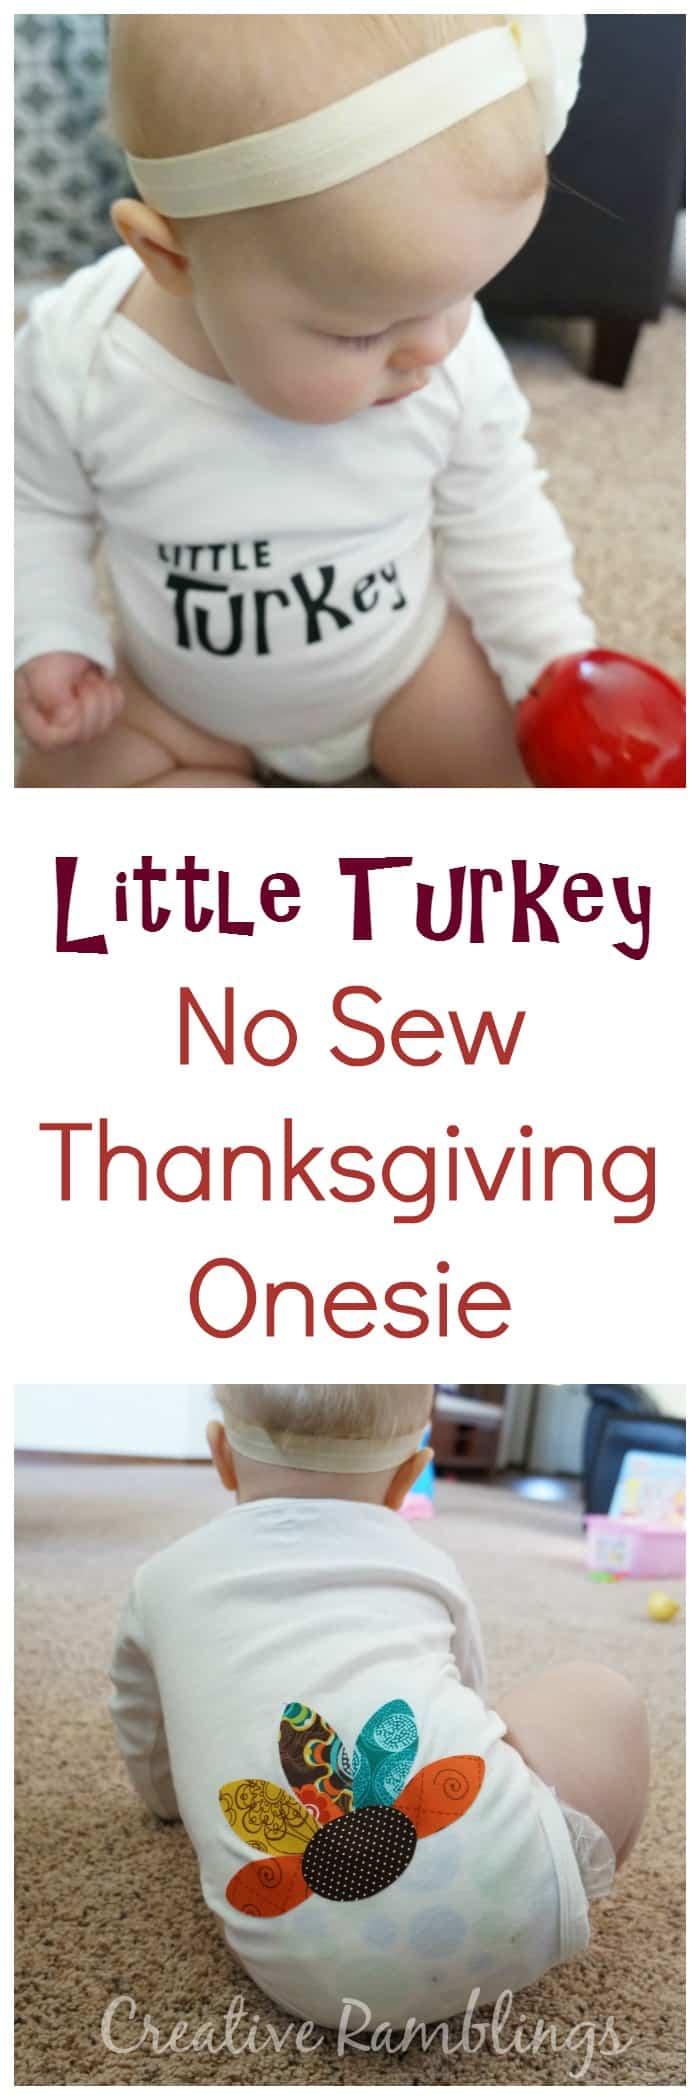 Little Turkey No Sew Thanksgiving Onesie Creative Ramblings